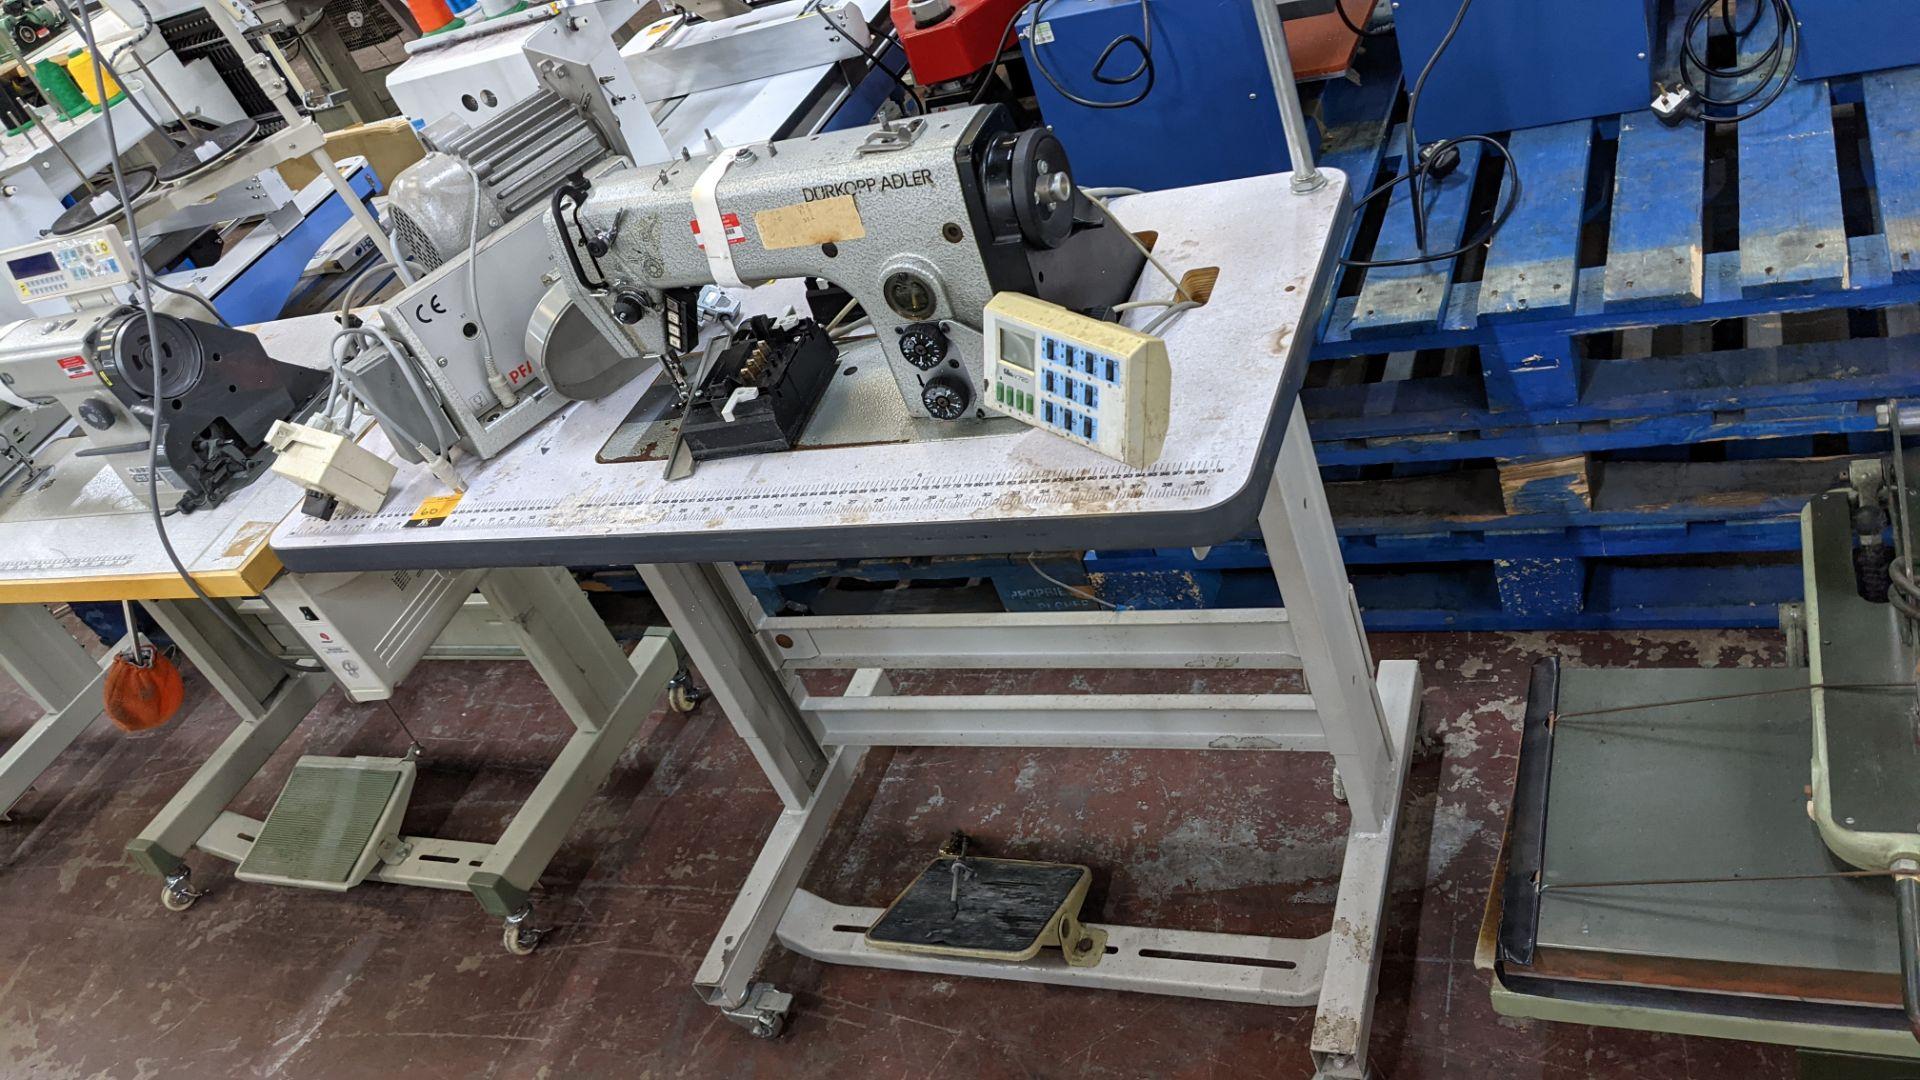 Durkopp Adler type 0271-L40042 sewing machine - Image 2 of 19